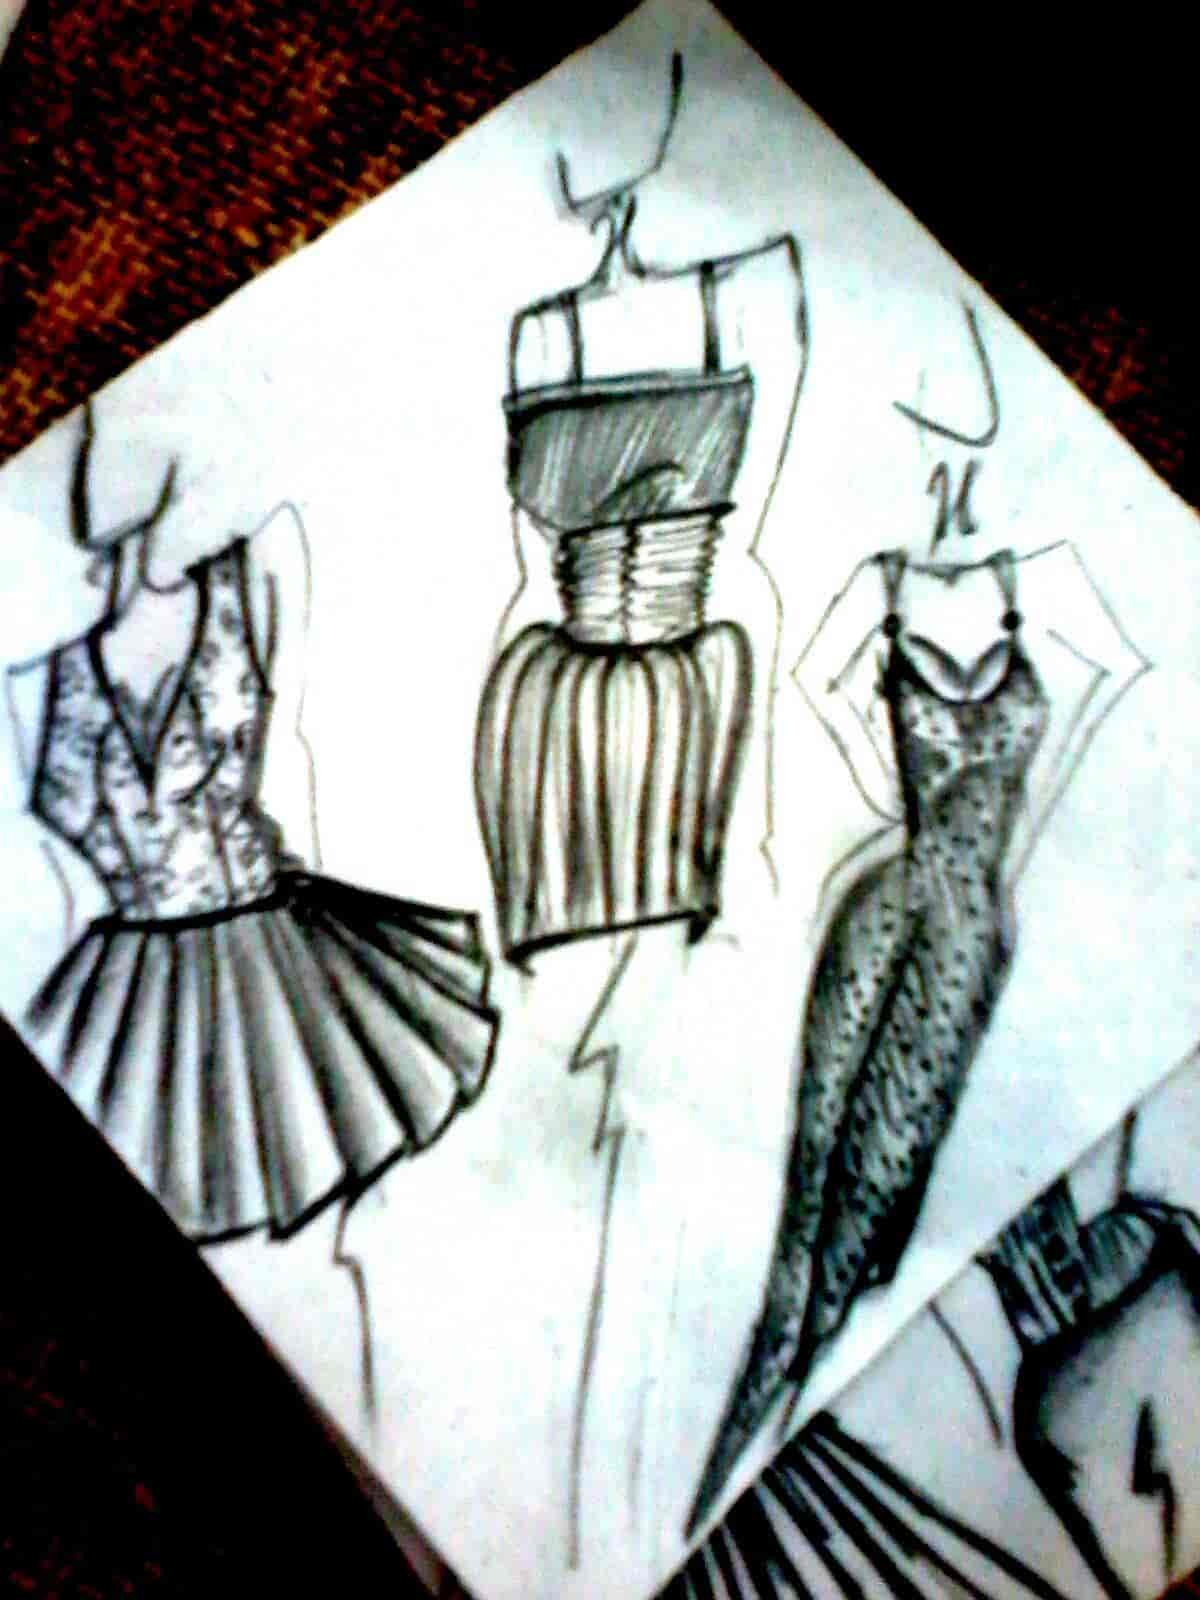 Pencil sketch raaga fashion school photos wilson garden bangalore fashion designing institutes